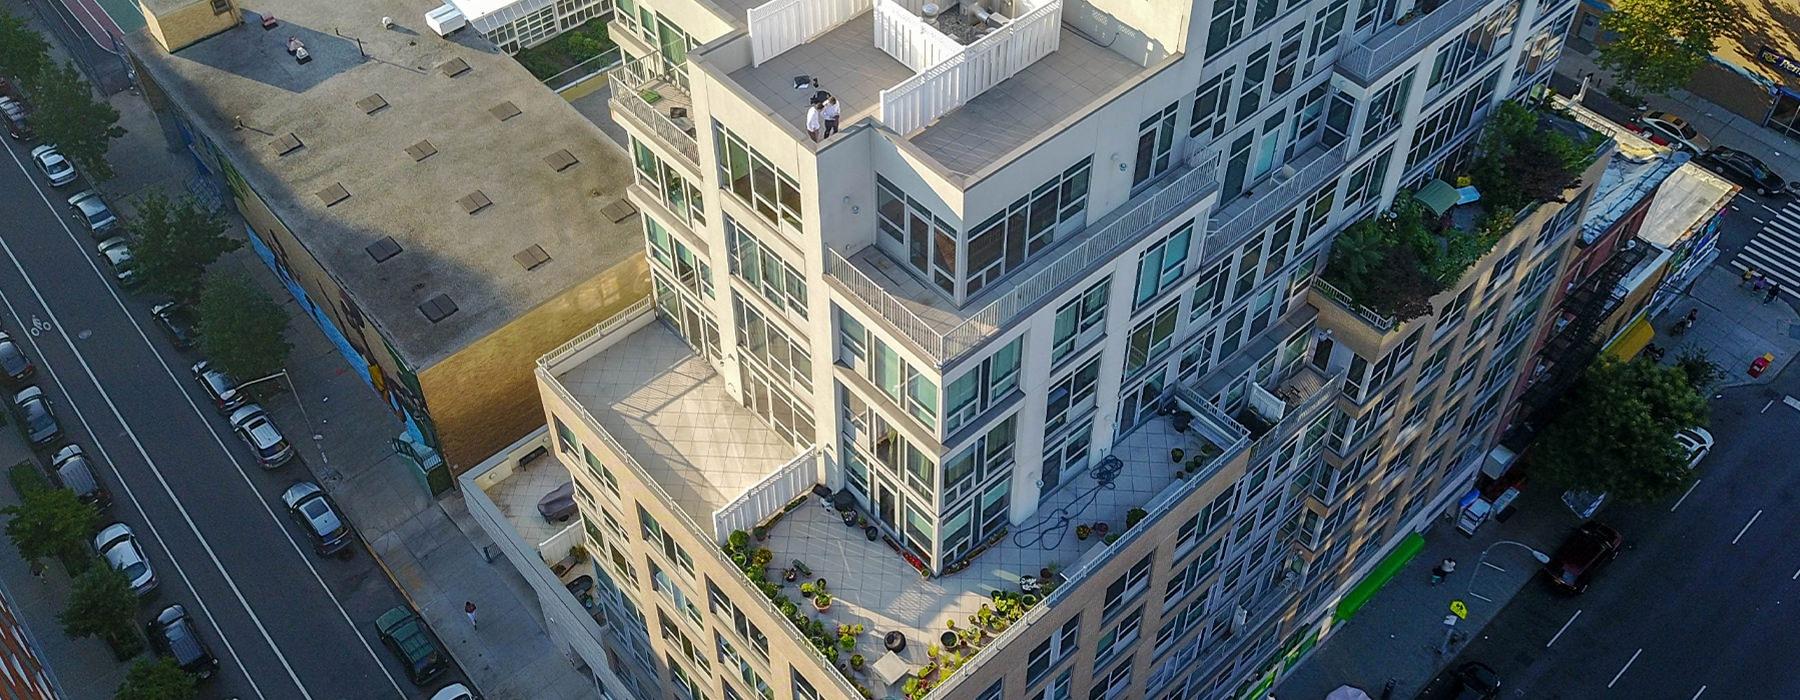 View the high-rise apartments, 119th & Third